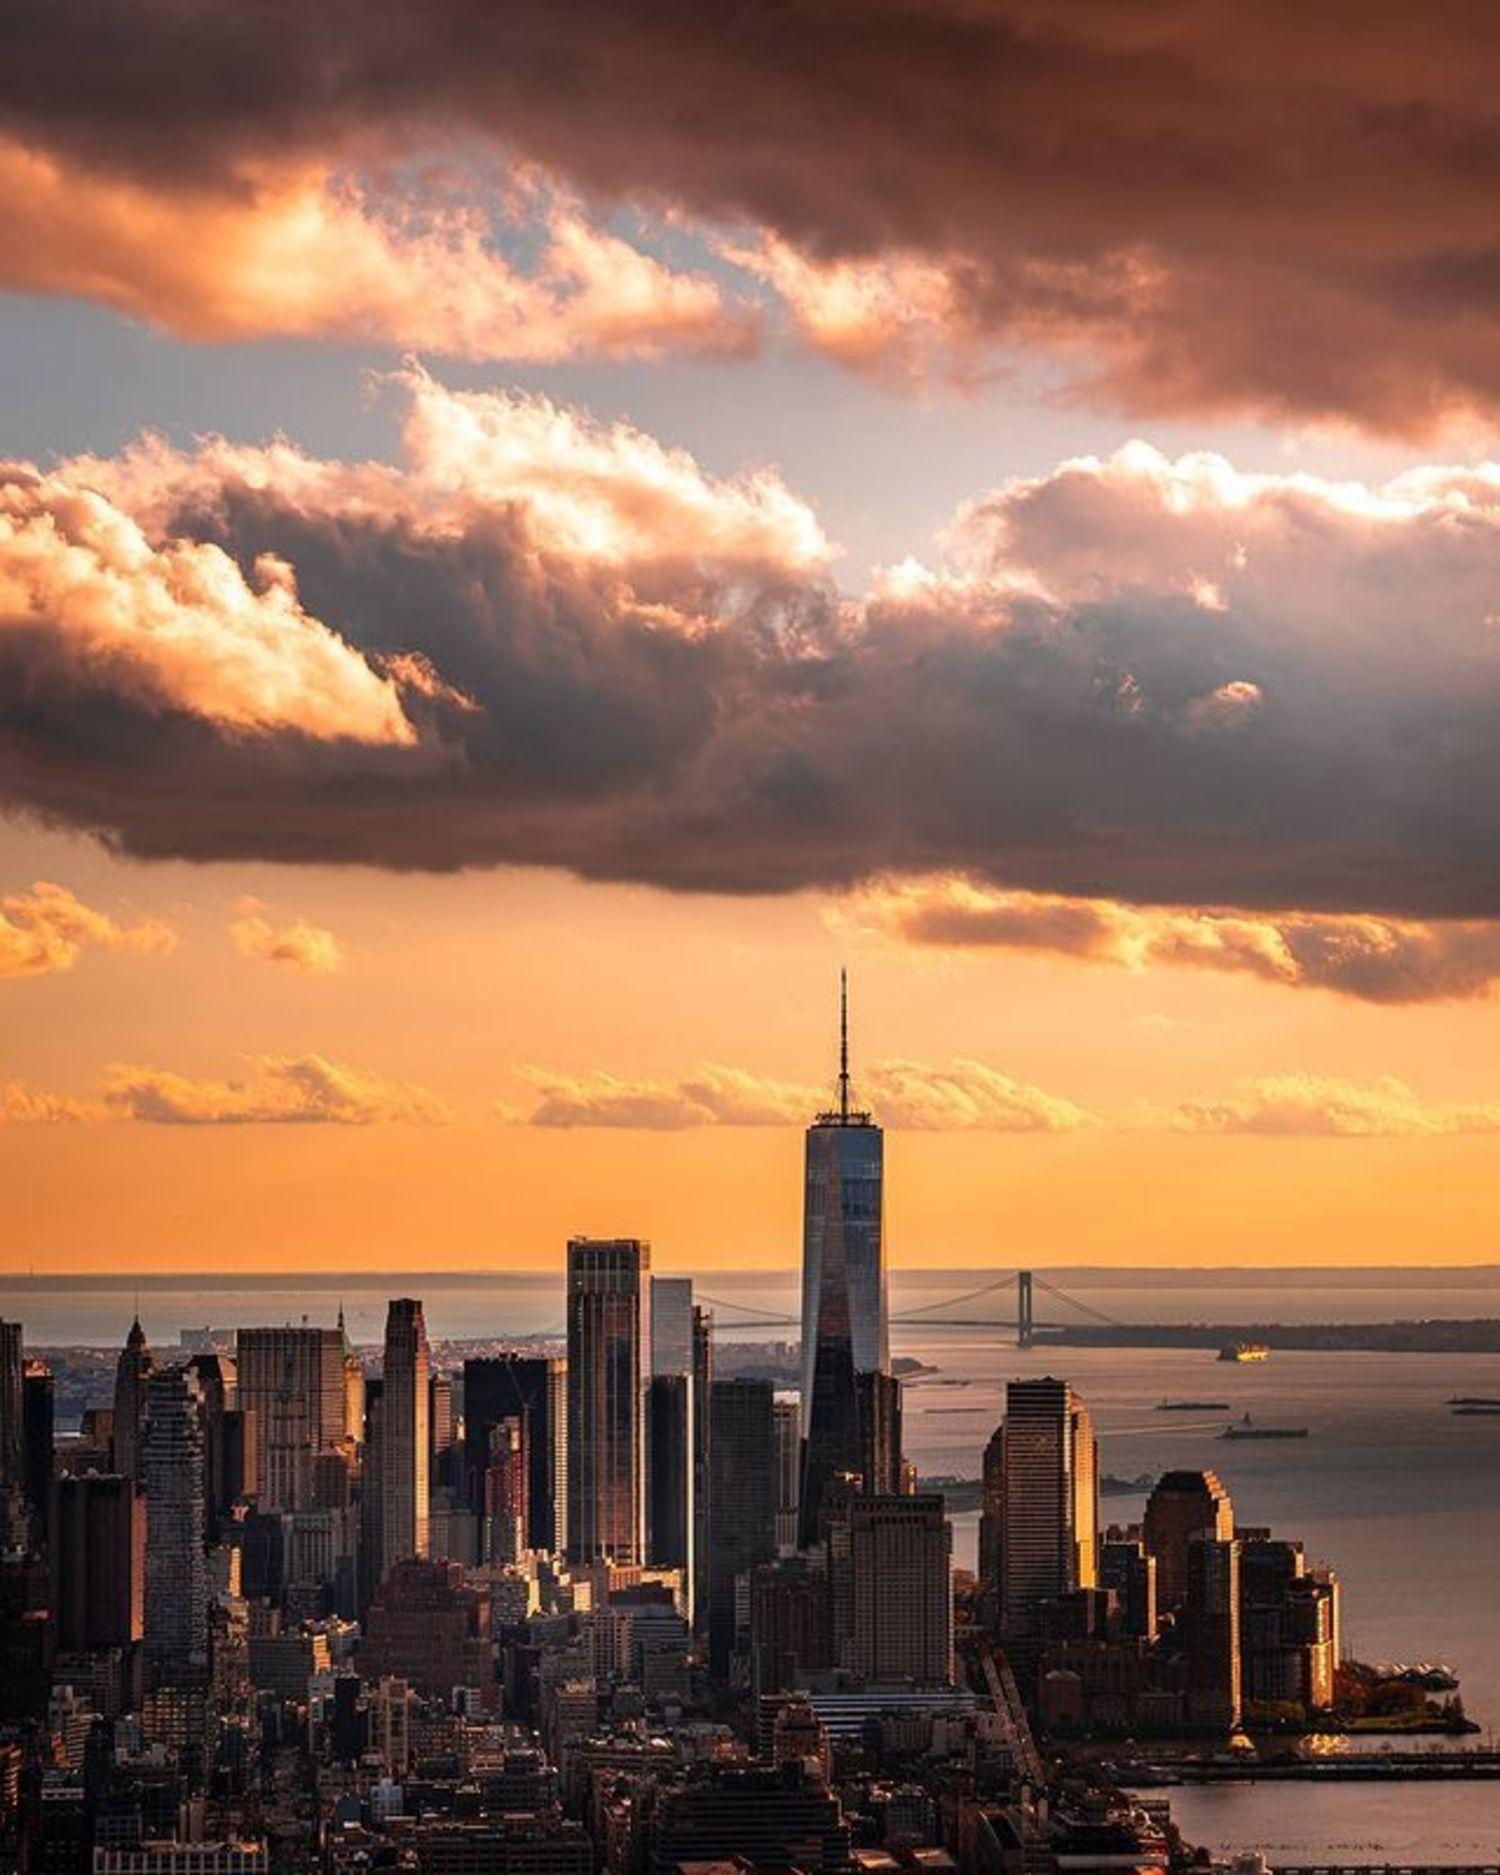 Sunset over Lower Manhattan from The Edge, Hudson Yards